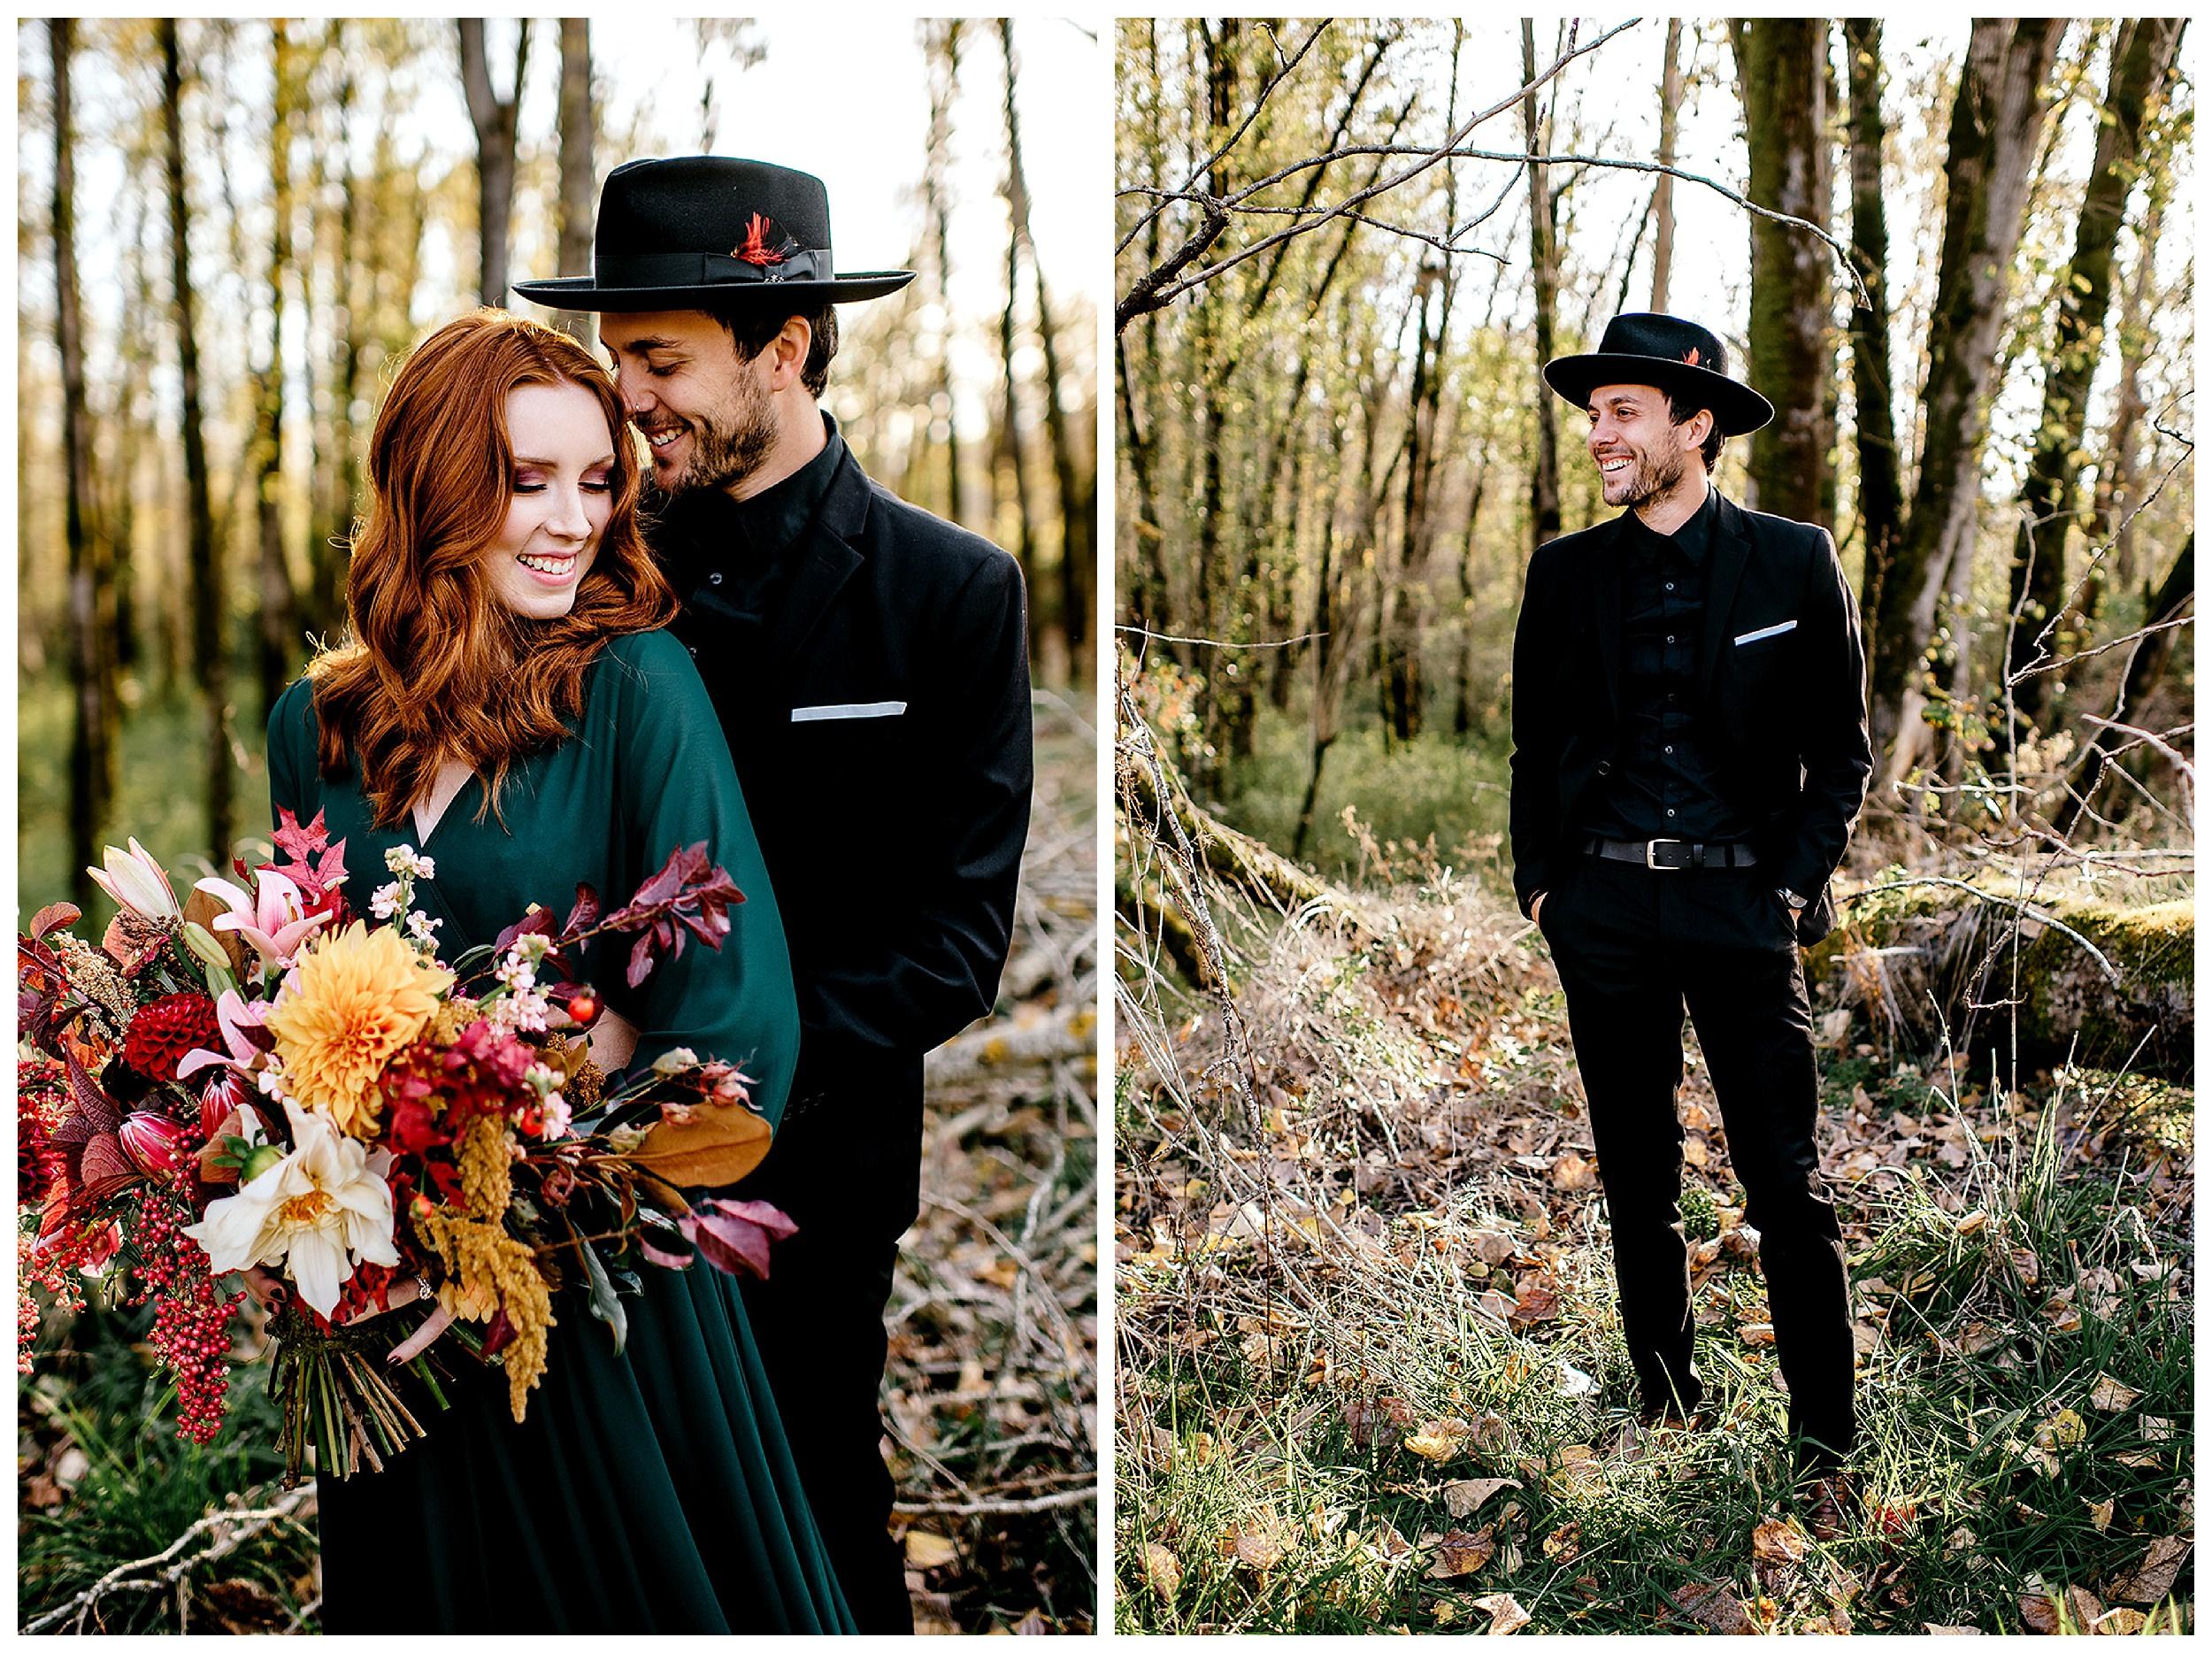 Portland-elopement-photographer-Autunm-wedding-inspiration-08.jpg